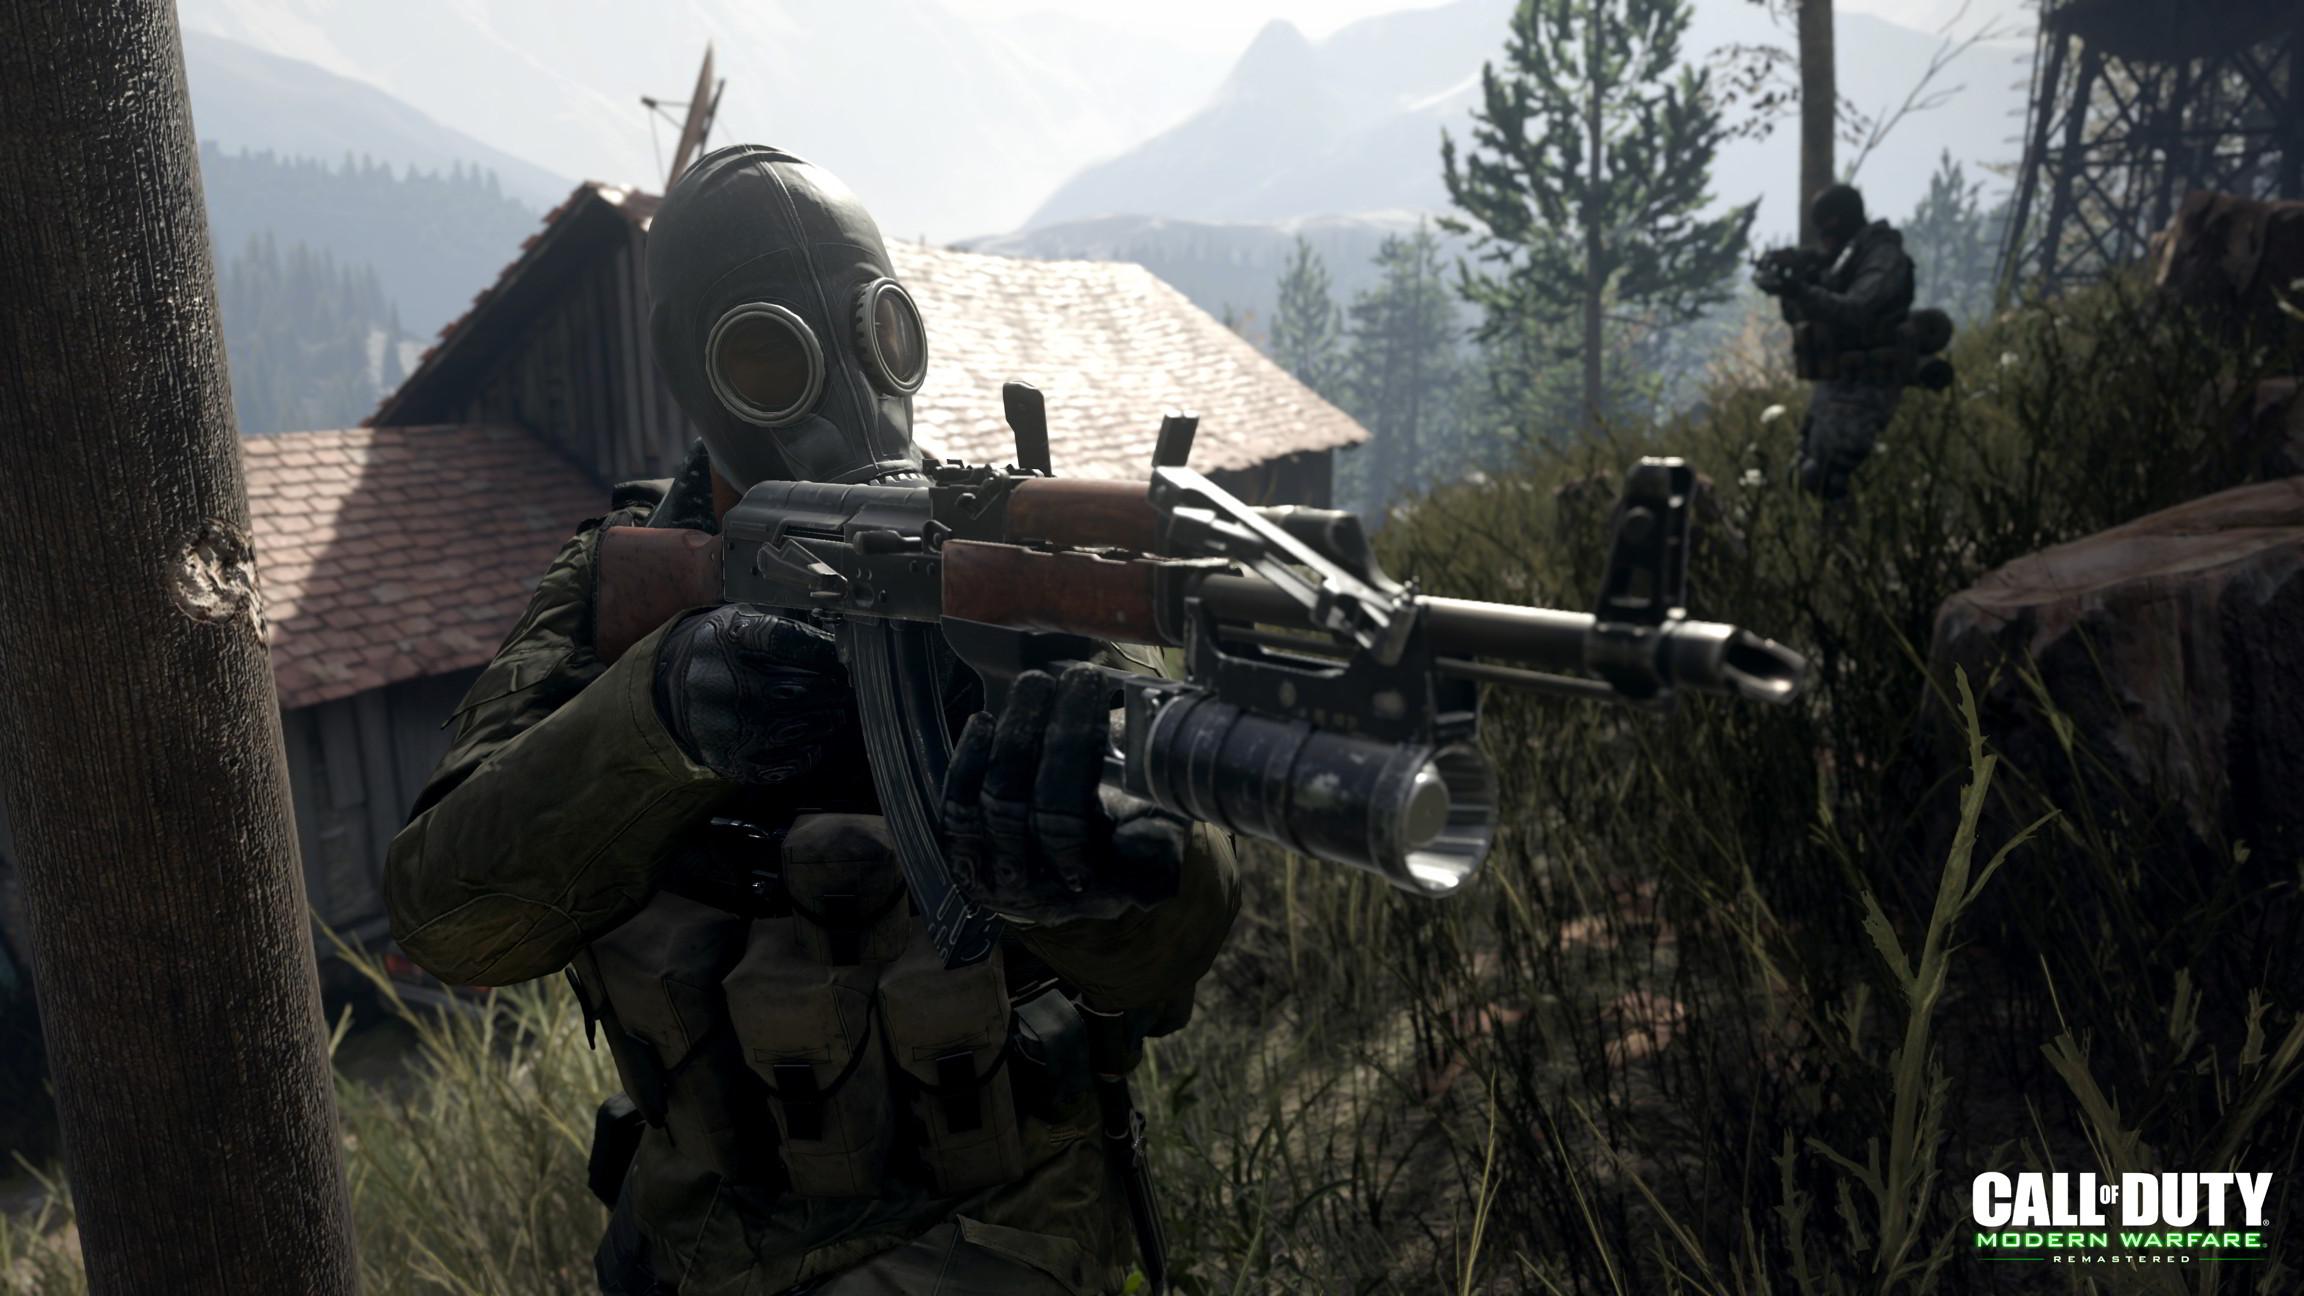 Kampania Call of Duty: Modern Warfare Remastered już dostępna na PlayStation 4